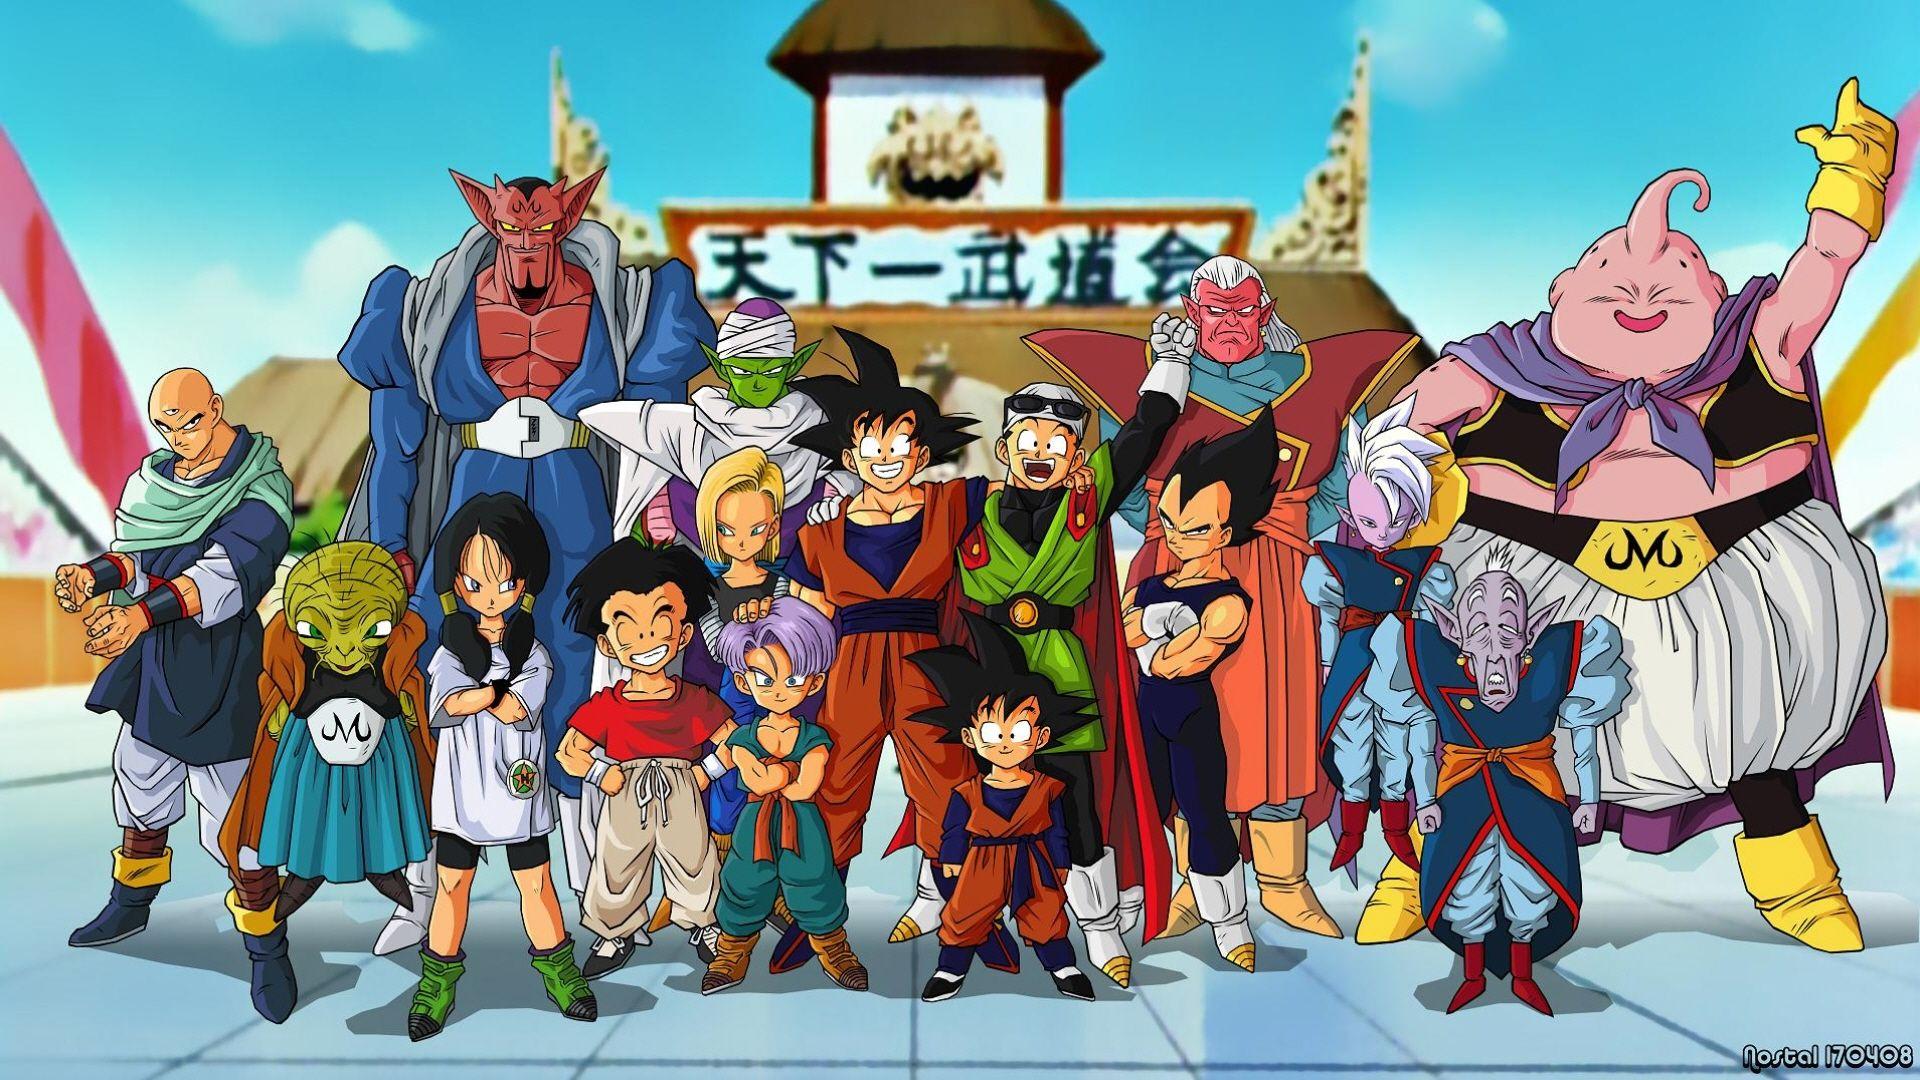 Goku and friends